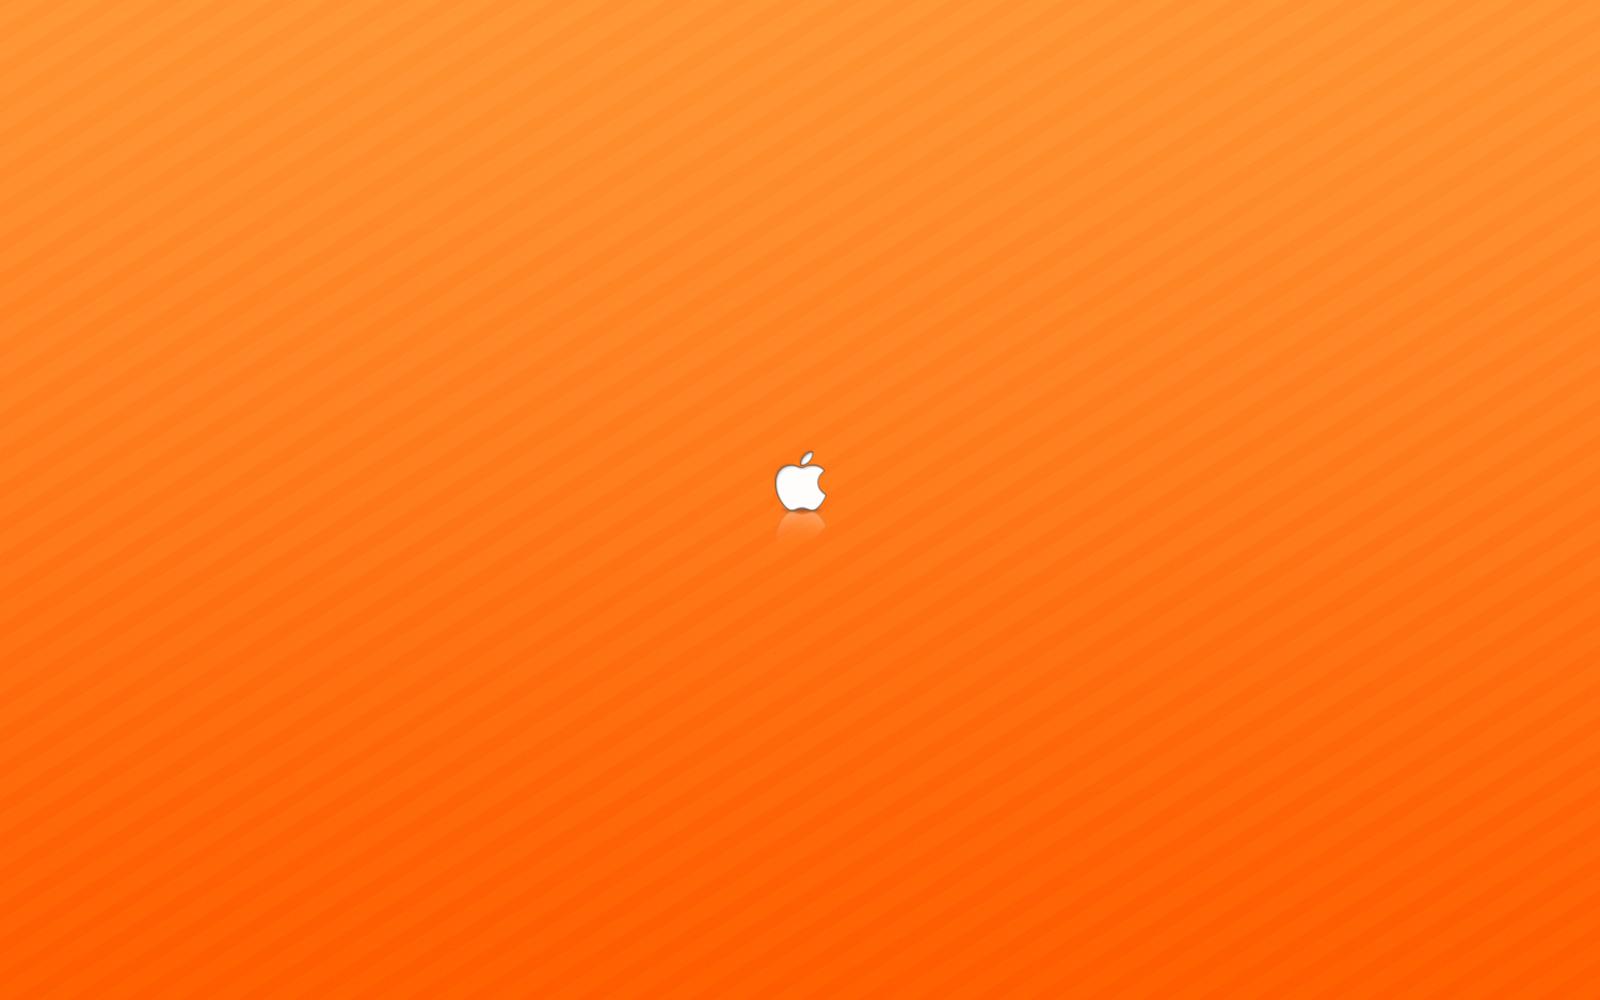 desktop orange wallpapers orange wallpaper orange background hd 22jpg 1600x1000